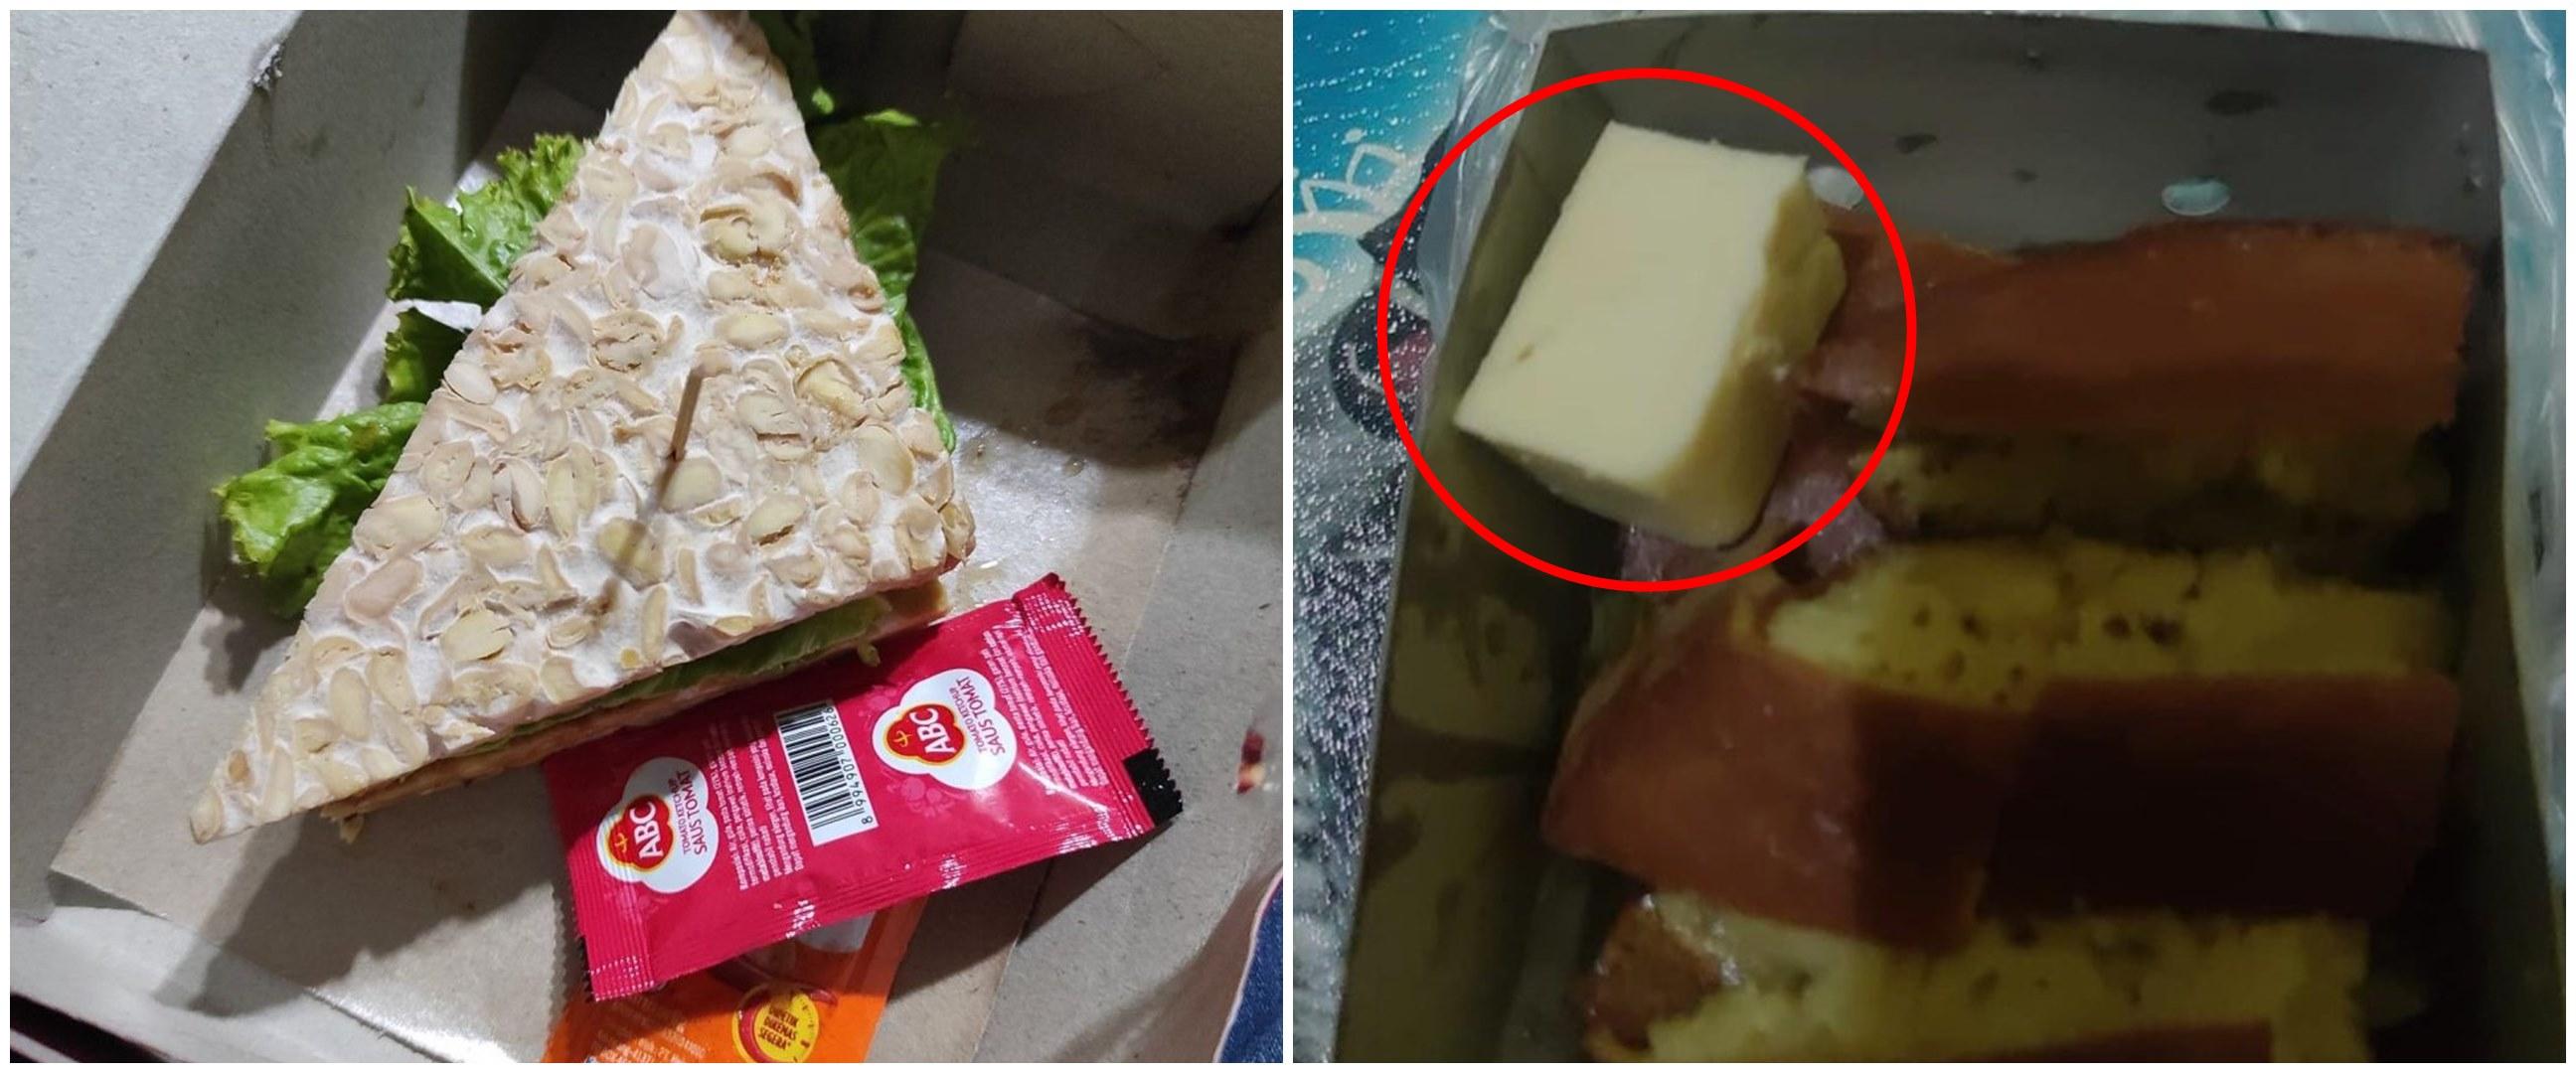 11 Momen lucu beli makanan ini bikin yang lihat ikut gagal paham